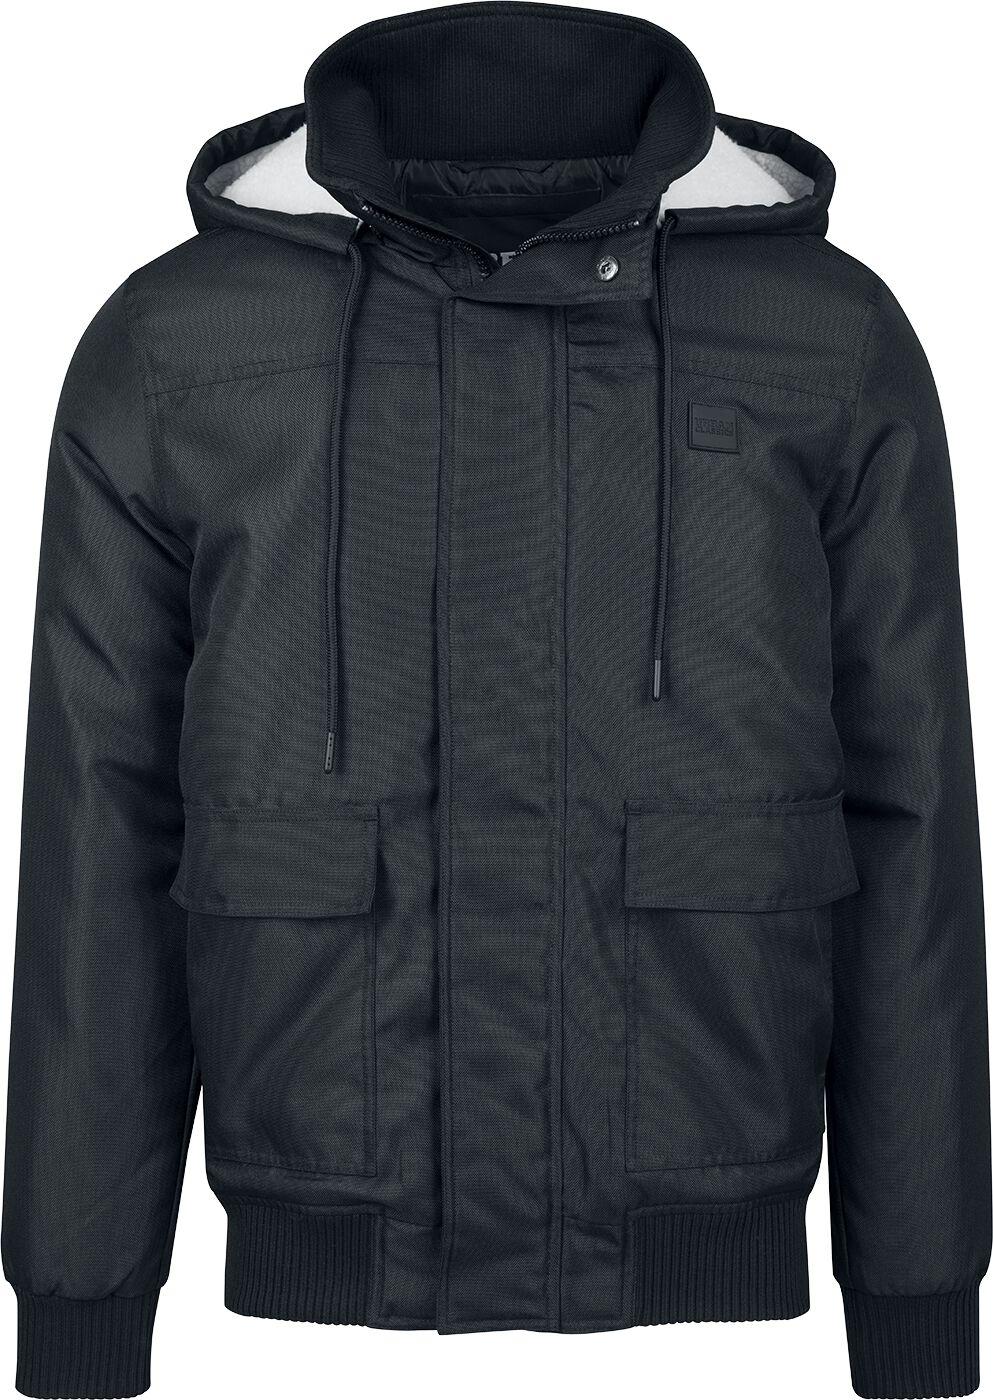 Image of   Urban Classics Heavy Hooded Jacket Jakke sort